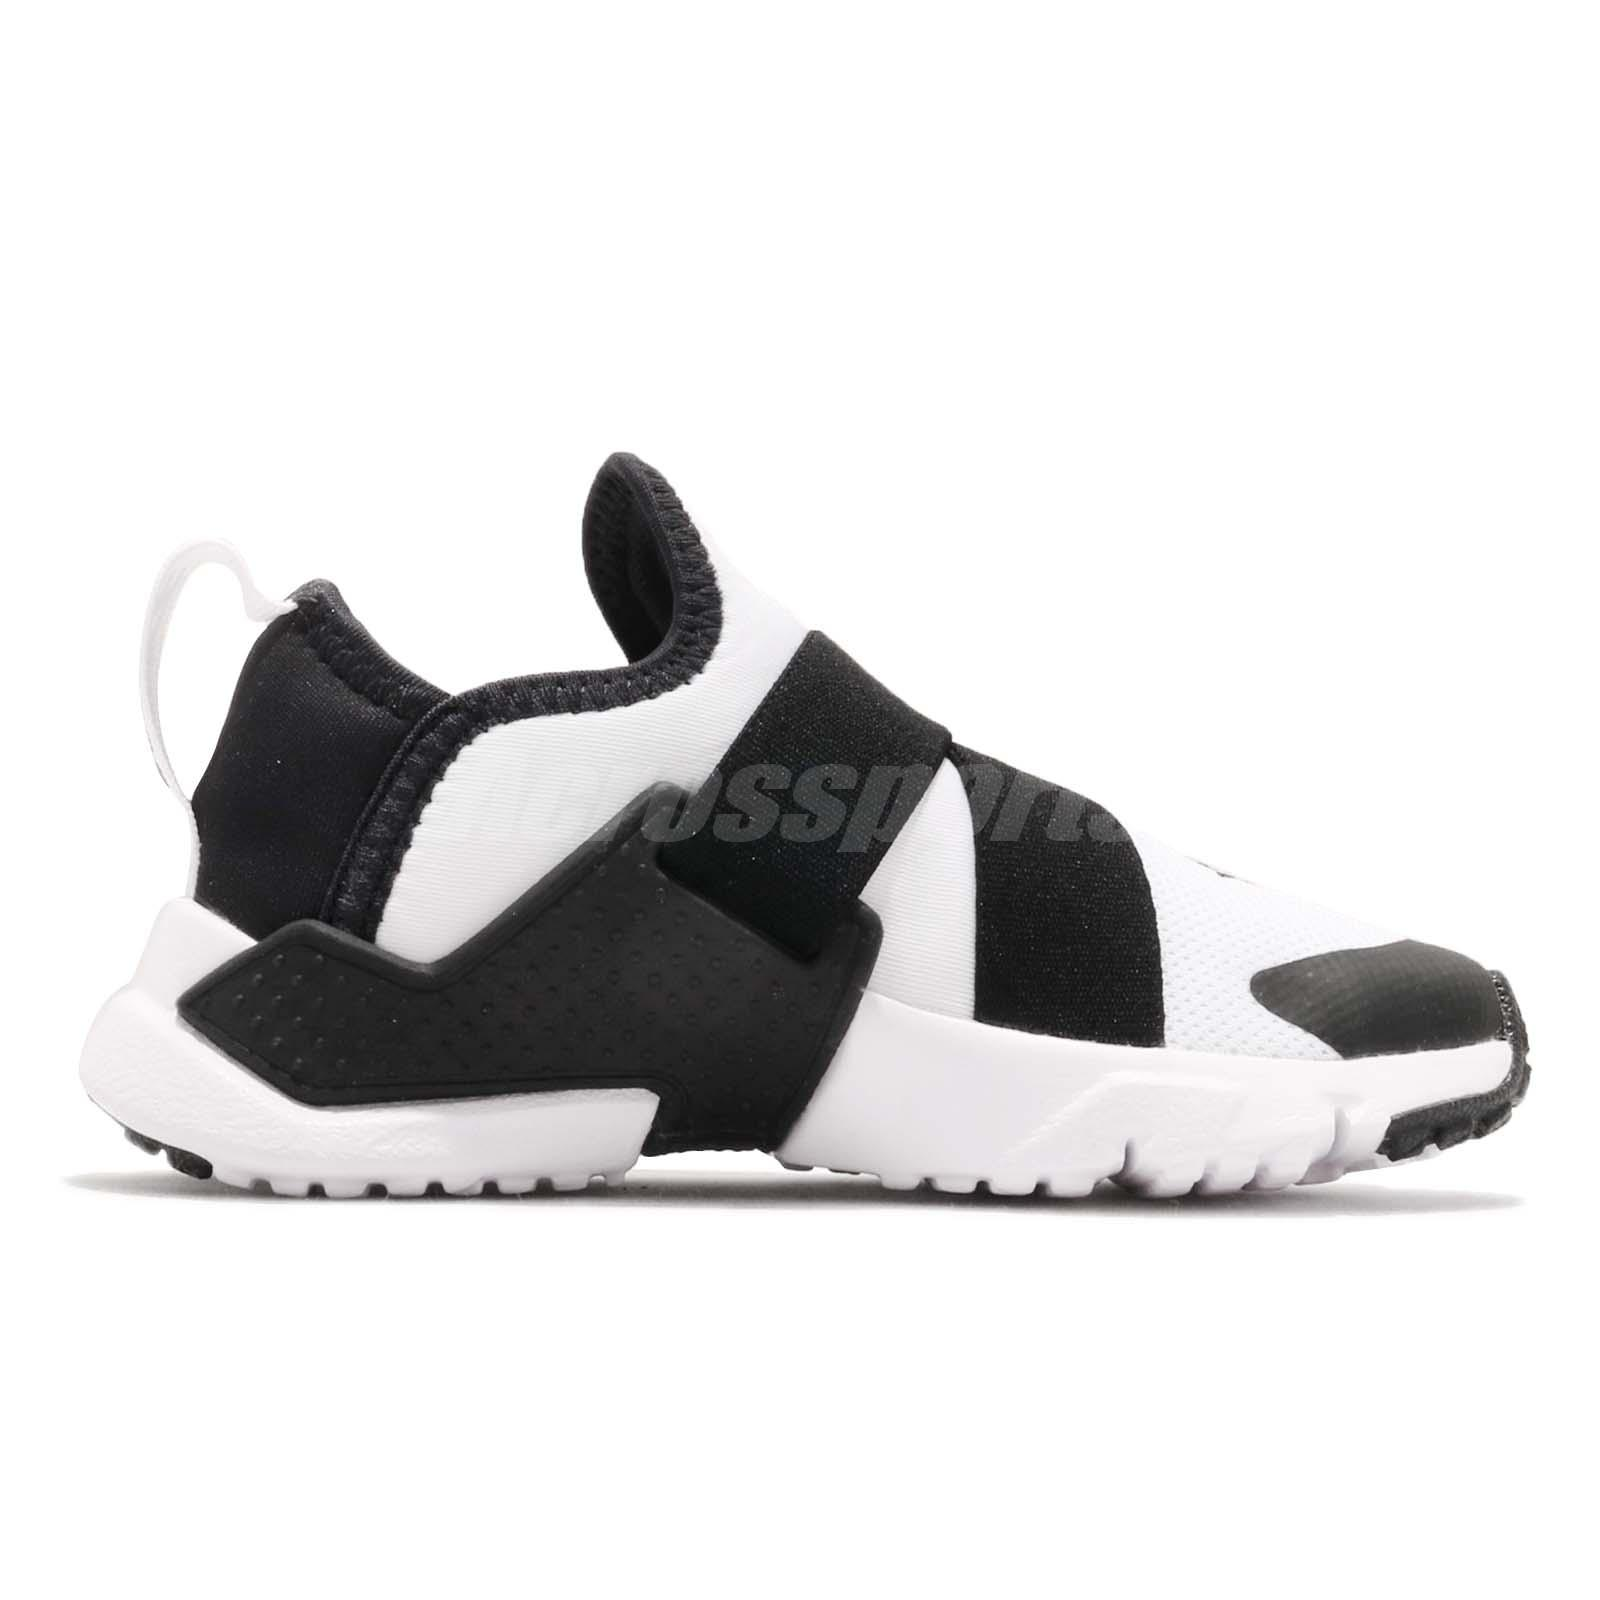 6f77ce83aa3d5 Nike Huarache Extreme PS White Black Preschool Boy Girl Slip On ...